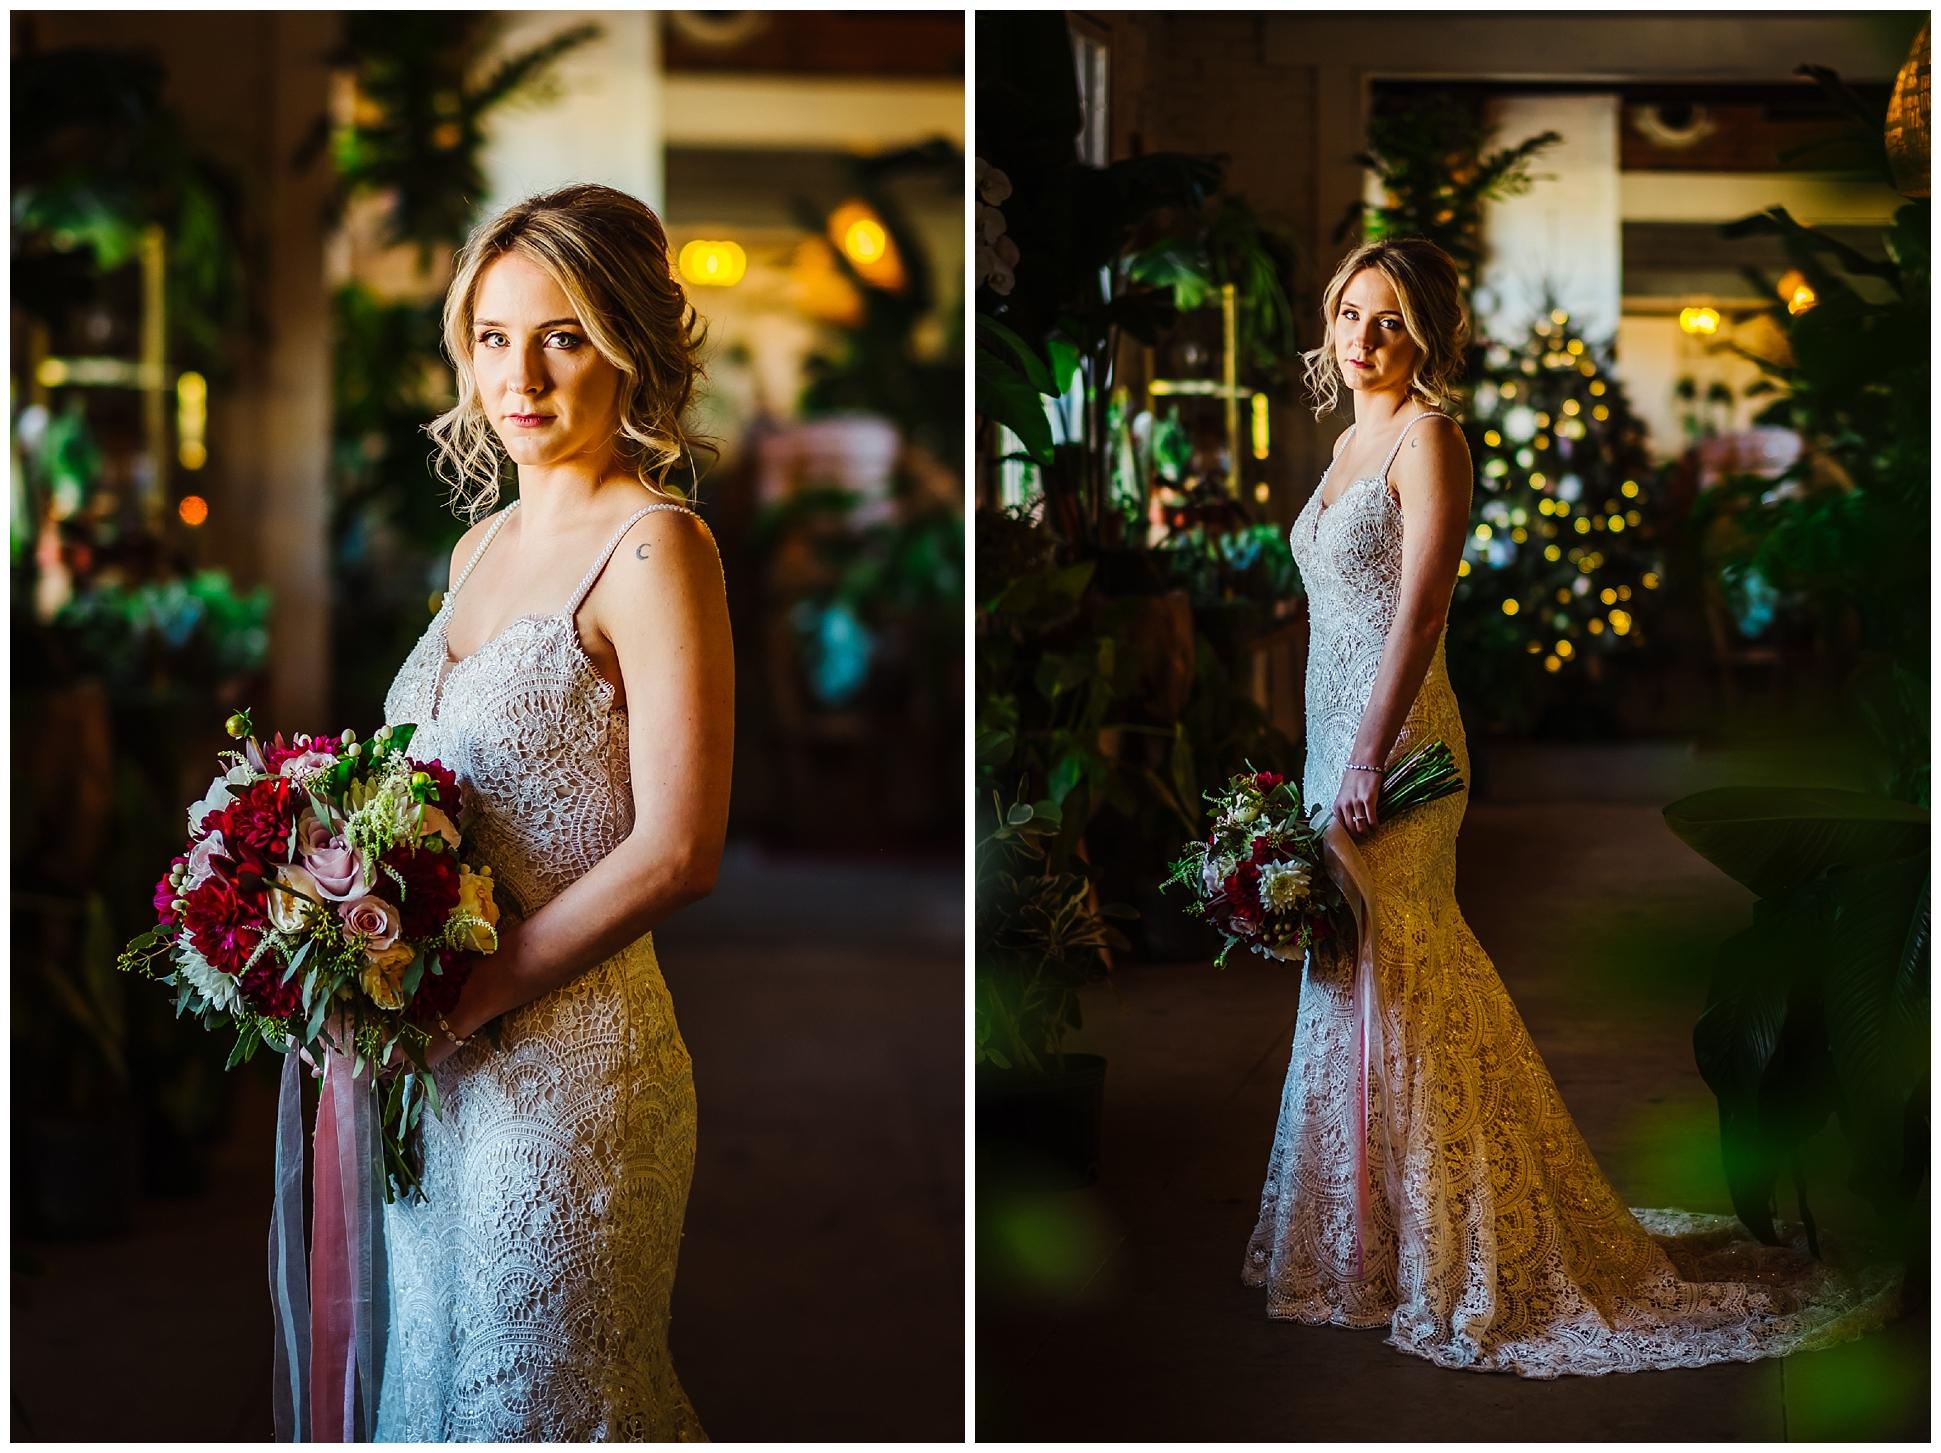 tampa-armeture-wedding-photographer-edgy-industrial-downtown-fancy-free-nursery-tattoo-burgandy-velvet_0028.jpg